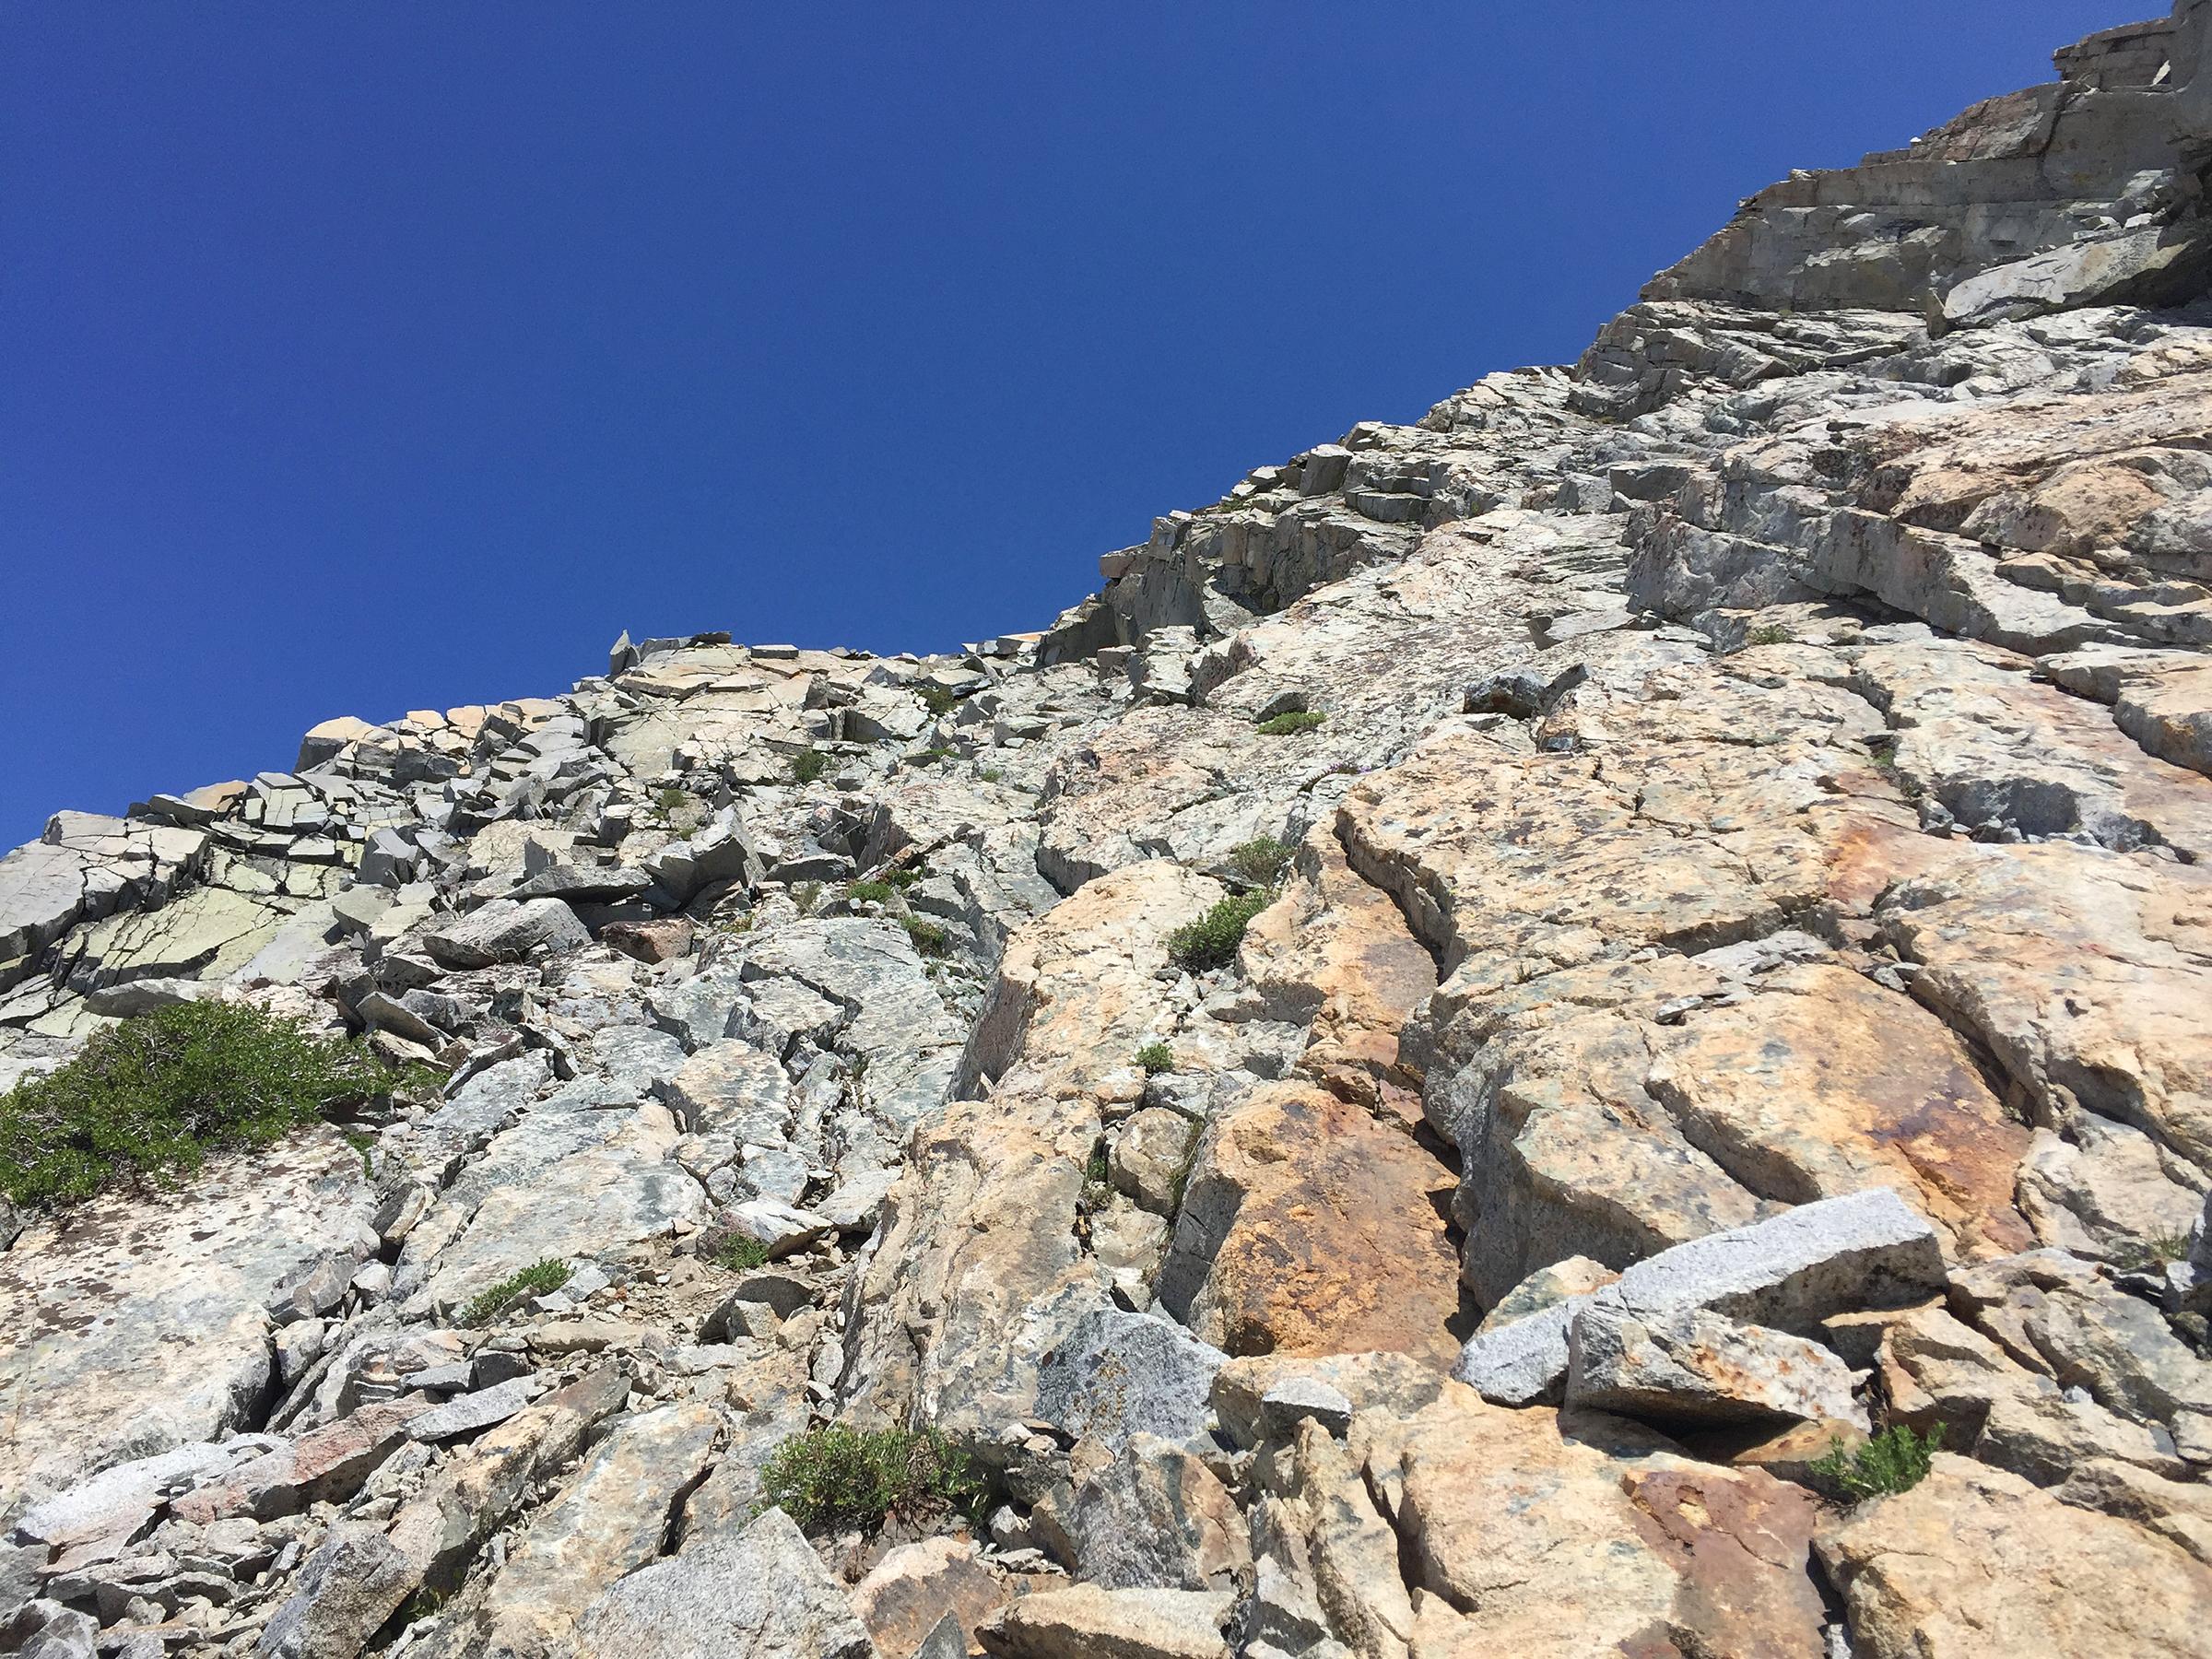 trailname-backstroke-sierra-high-route-2017_9873.jpg